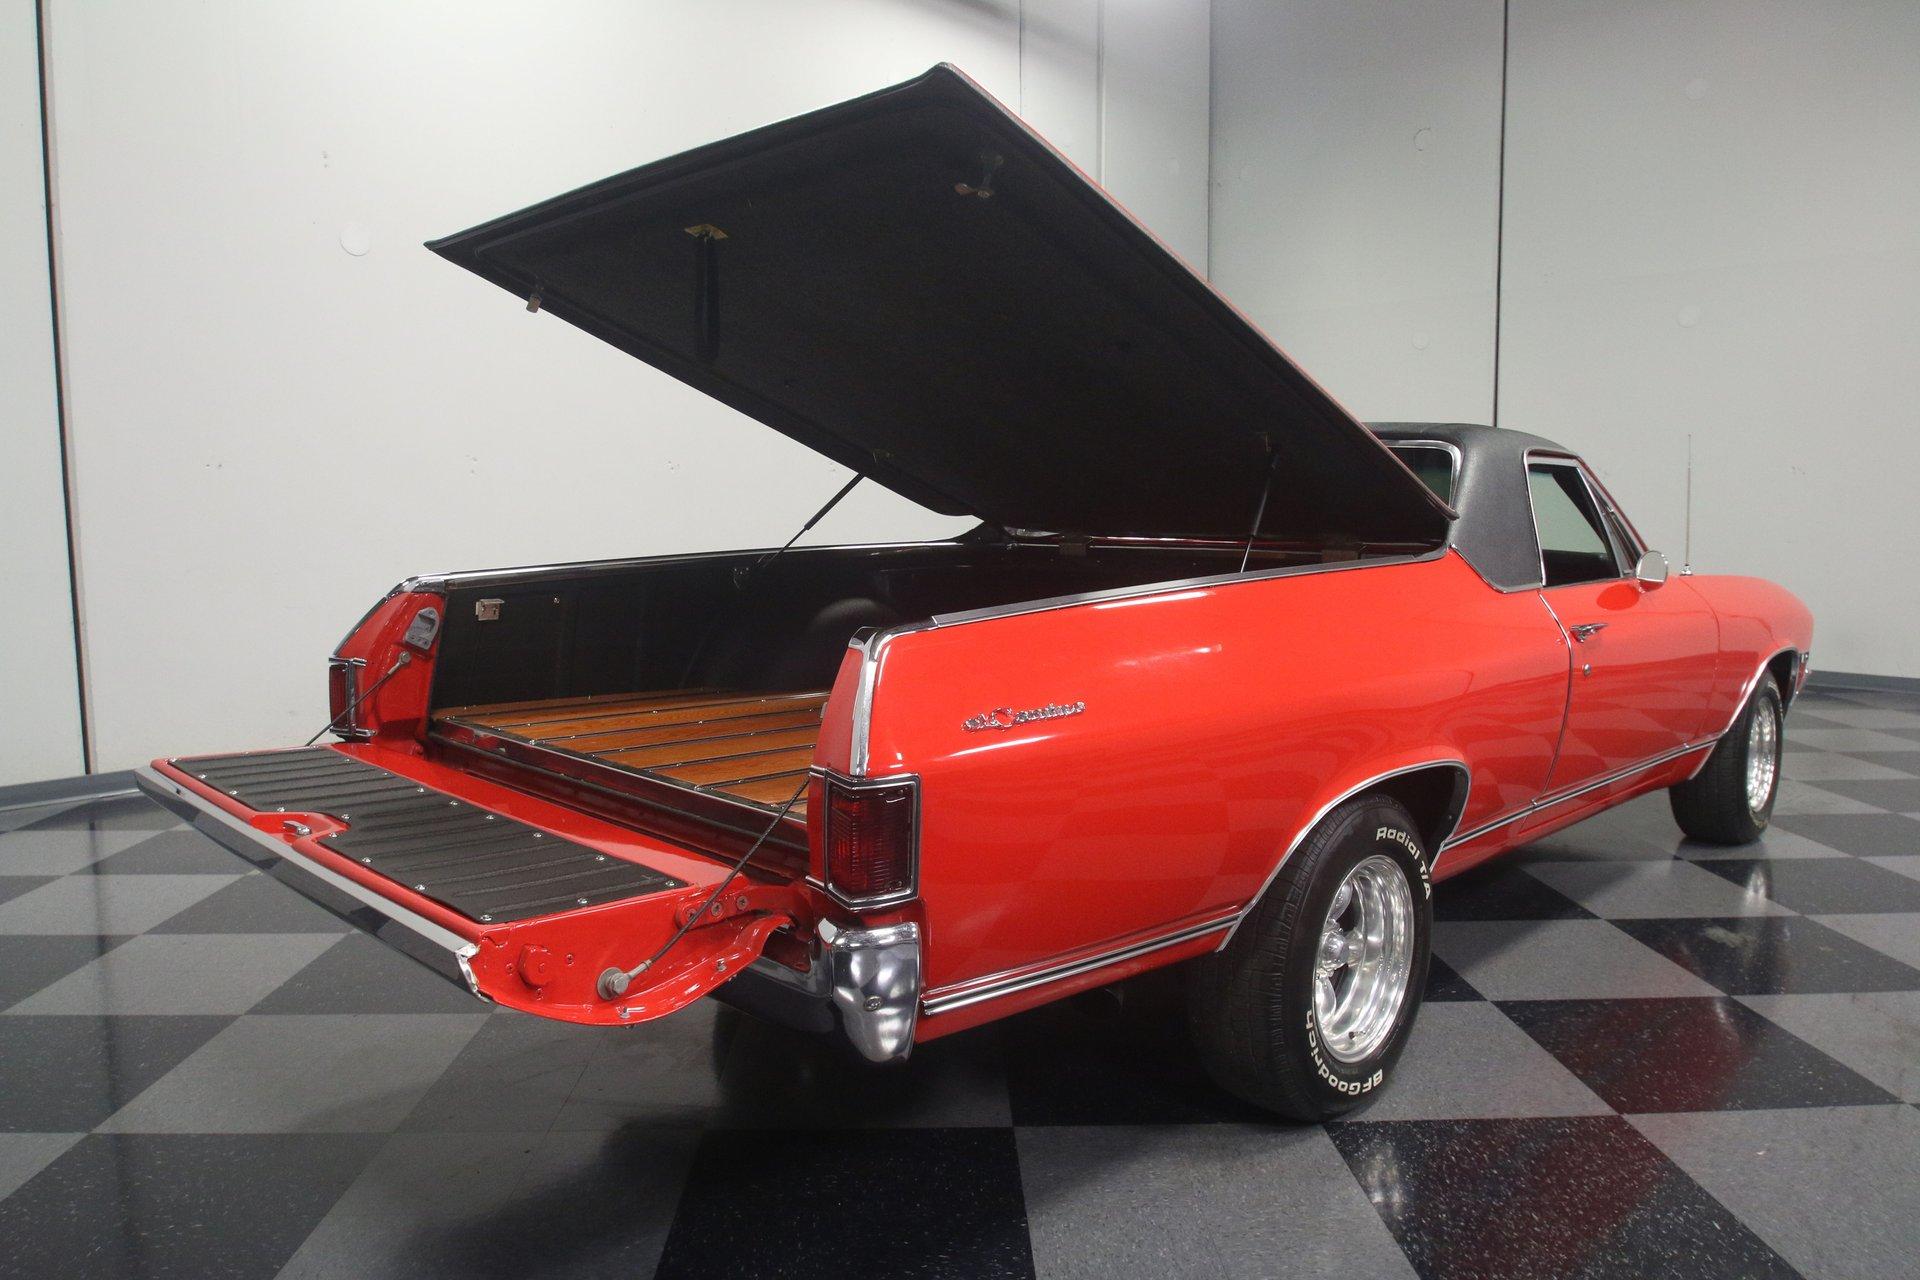 1968 Chevrolet El Camino Streetside Classics The Nations Chevy Spincar View Play Video 360